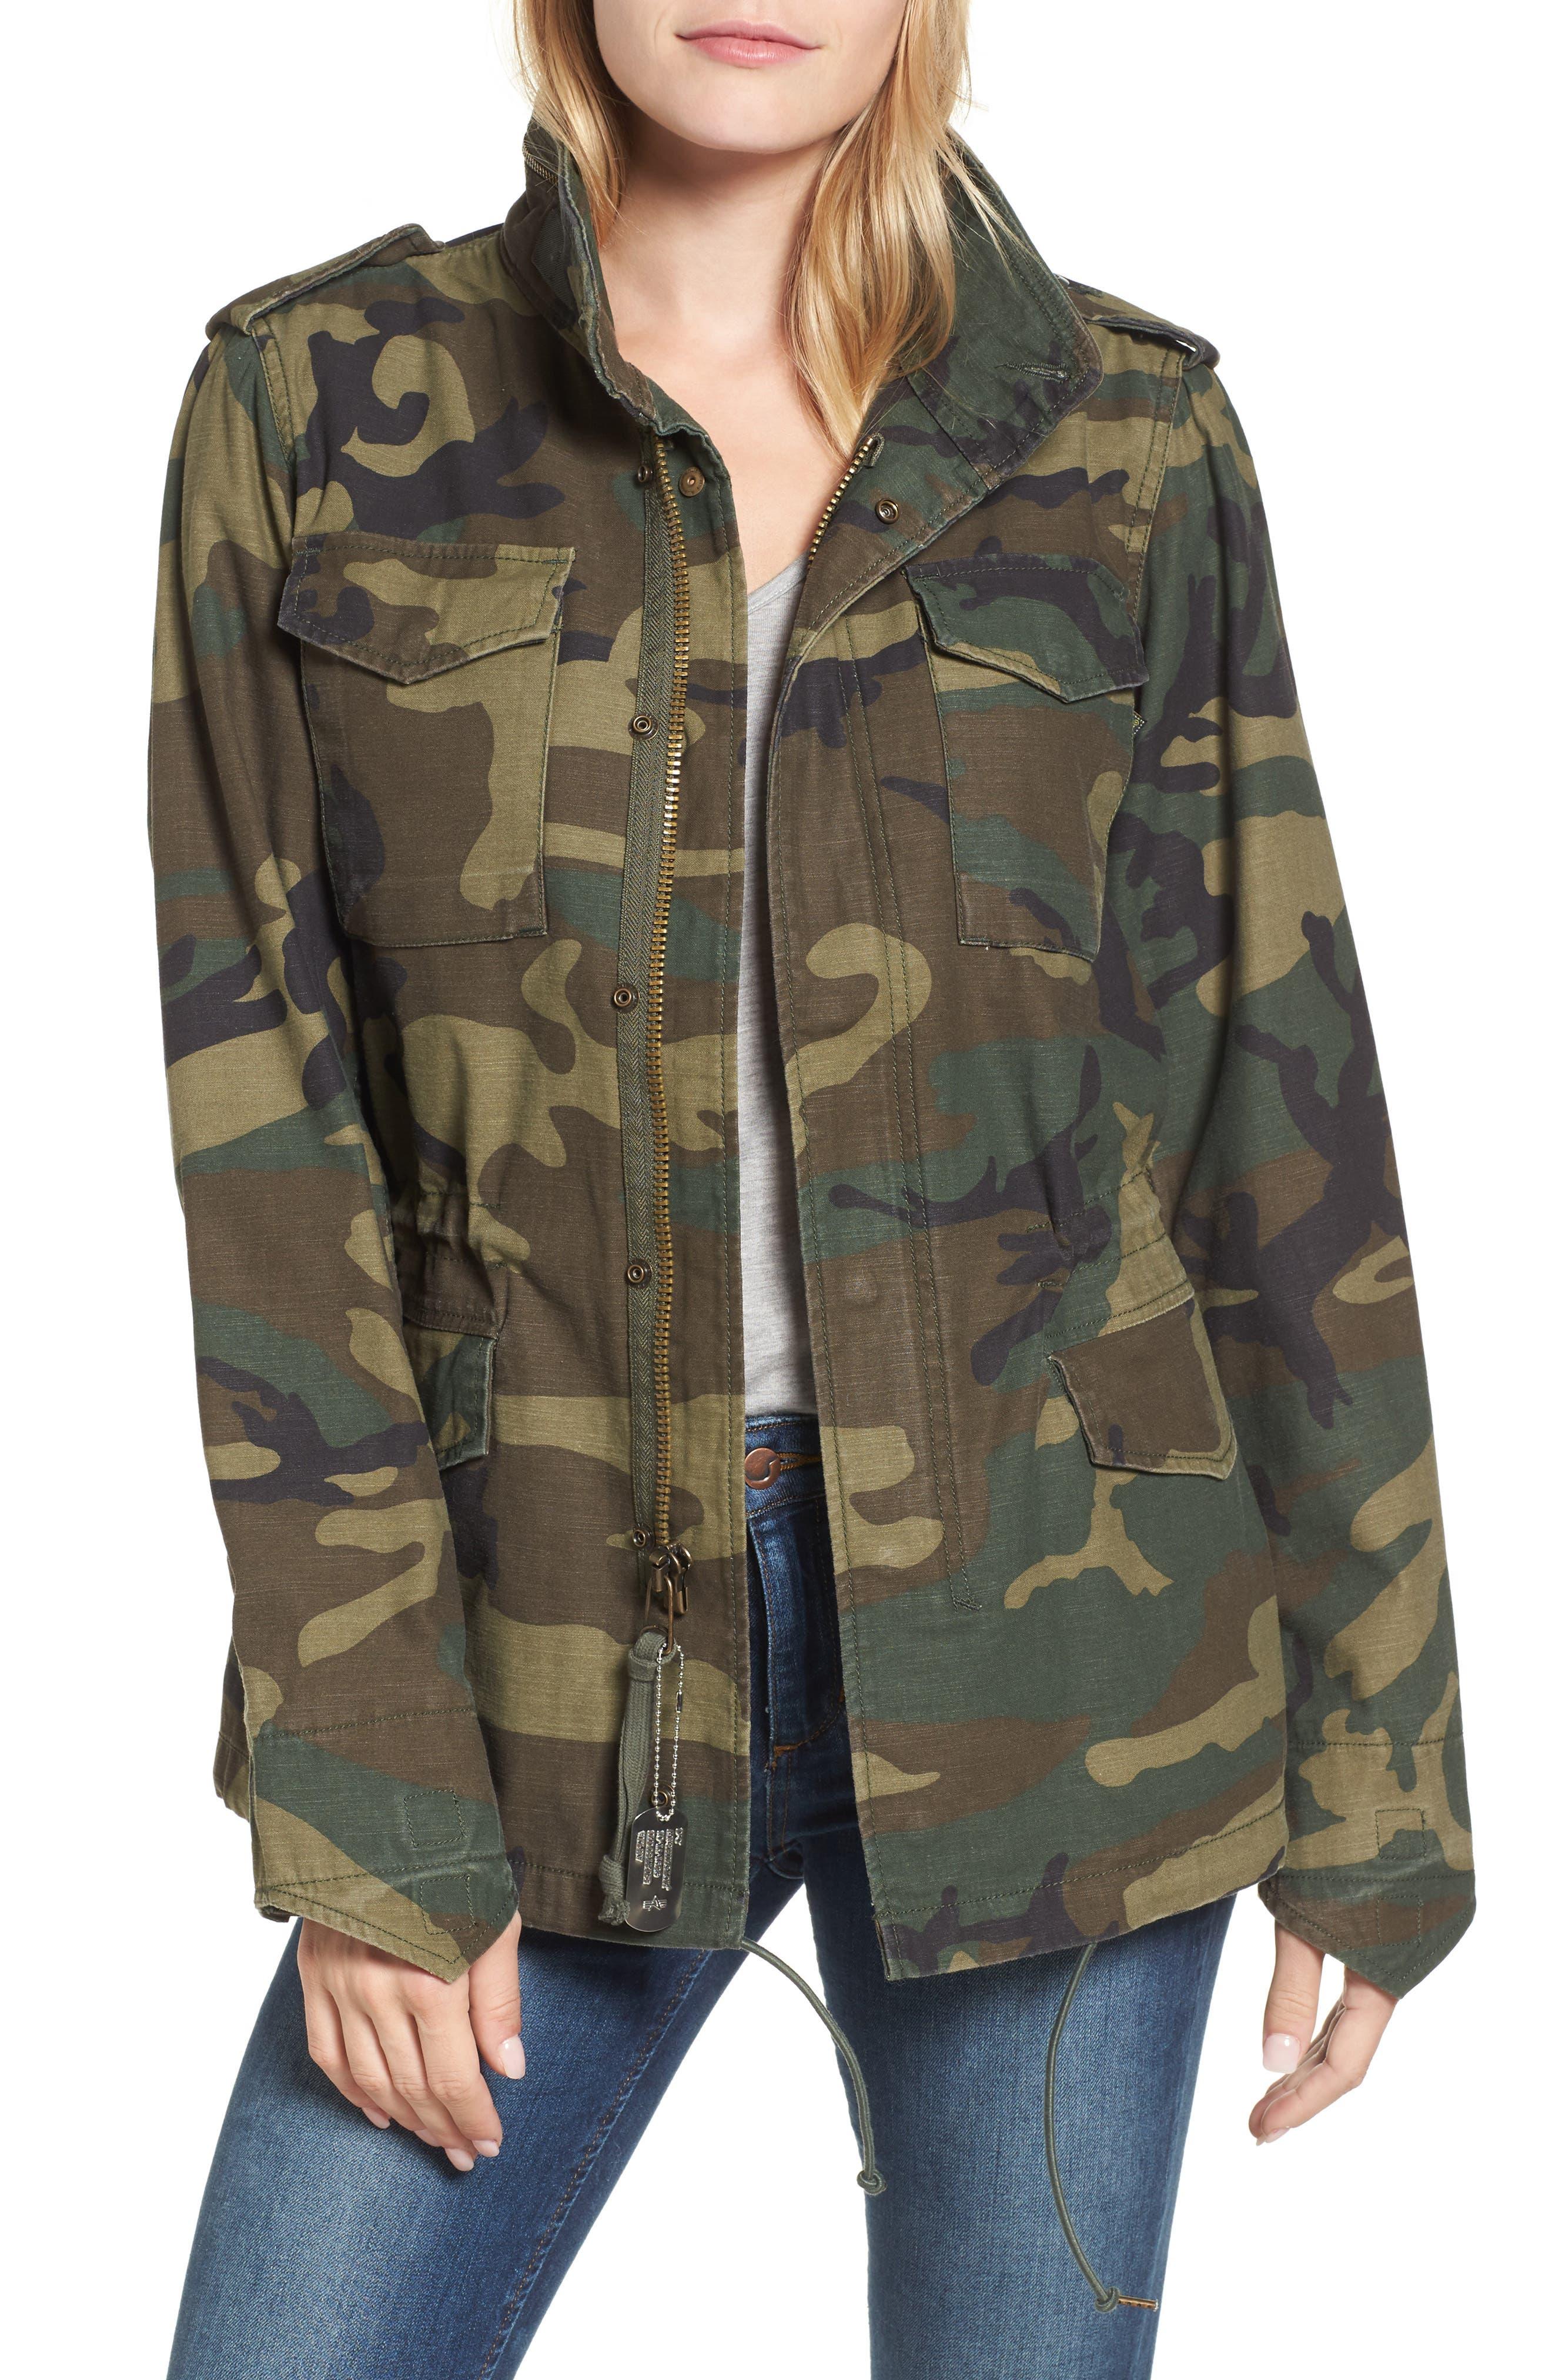 Alpha Industries M-65 Defender Camo Field Jacket